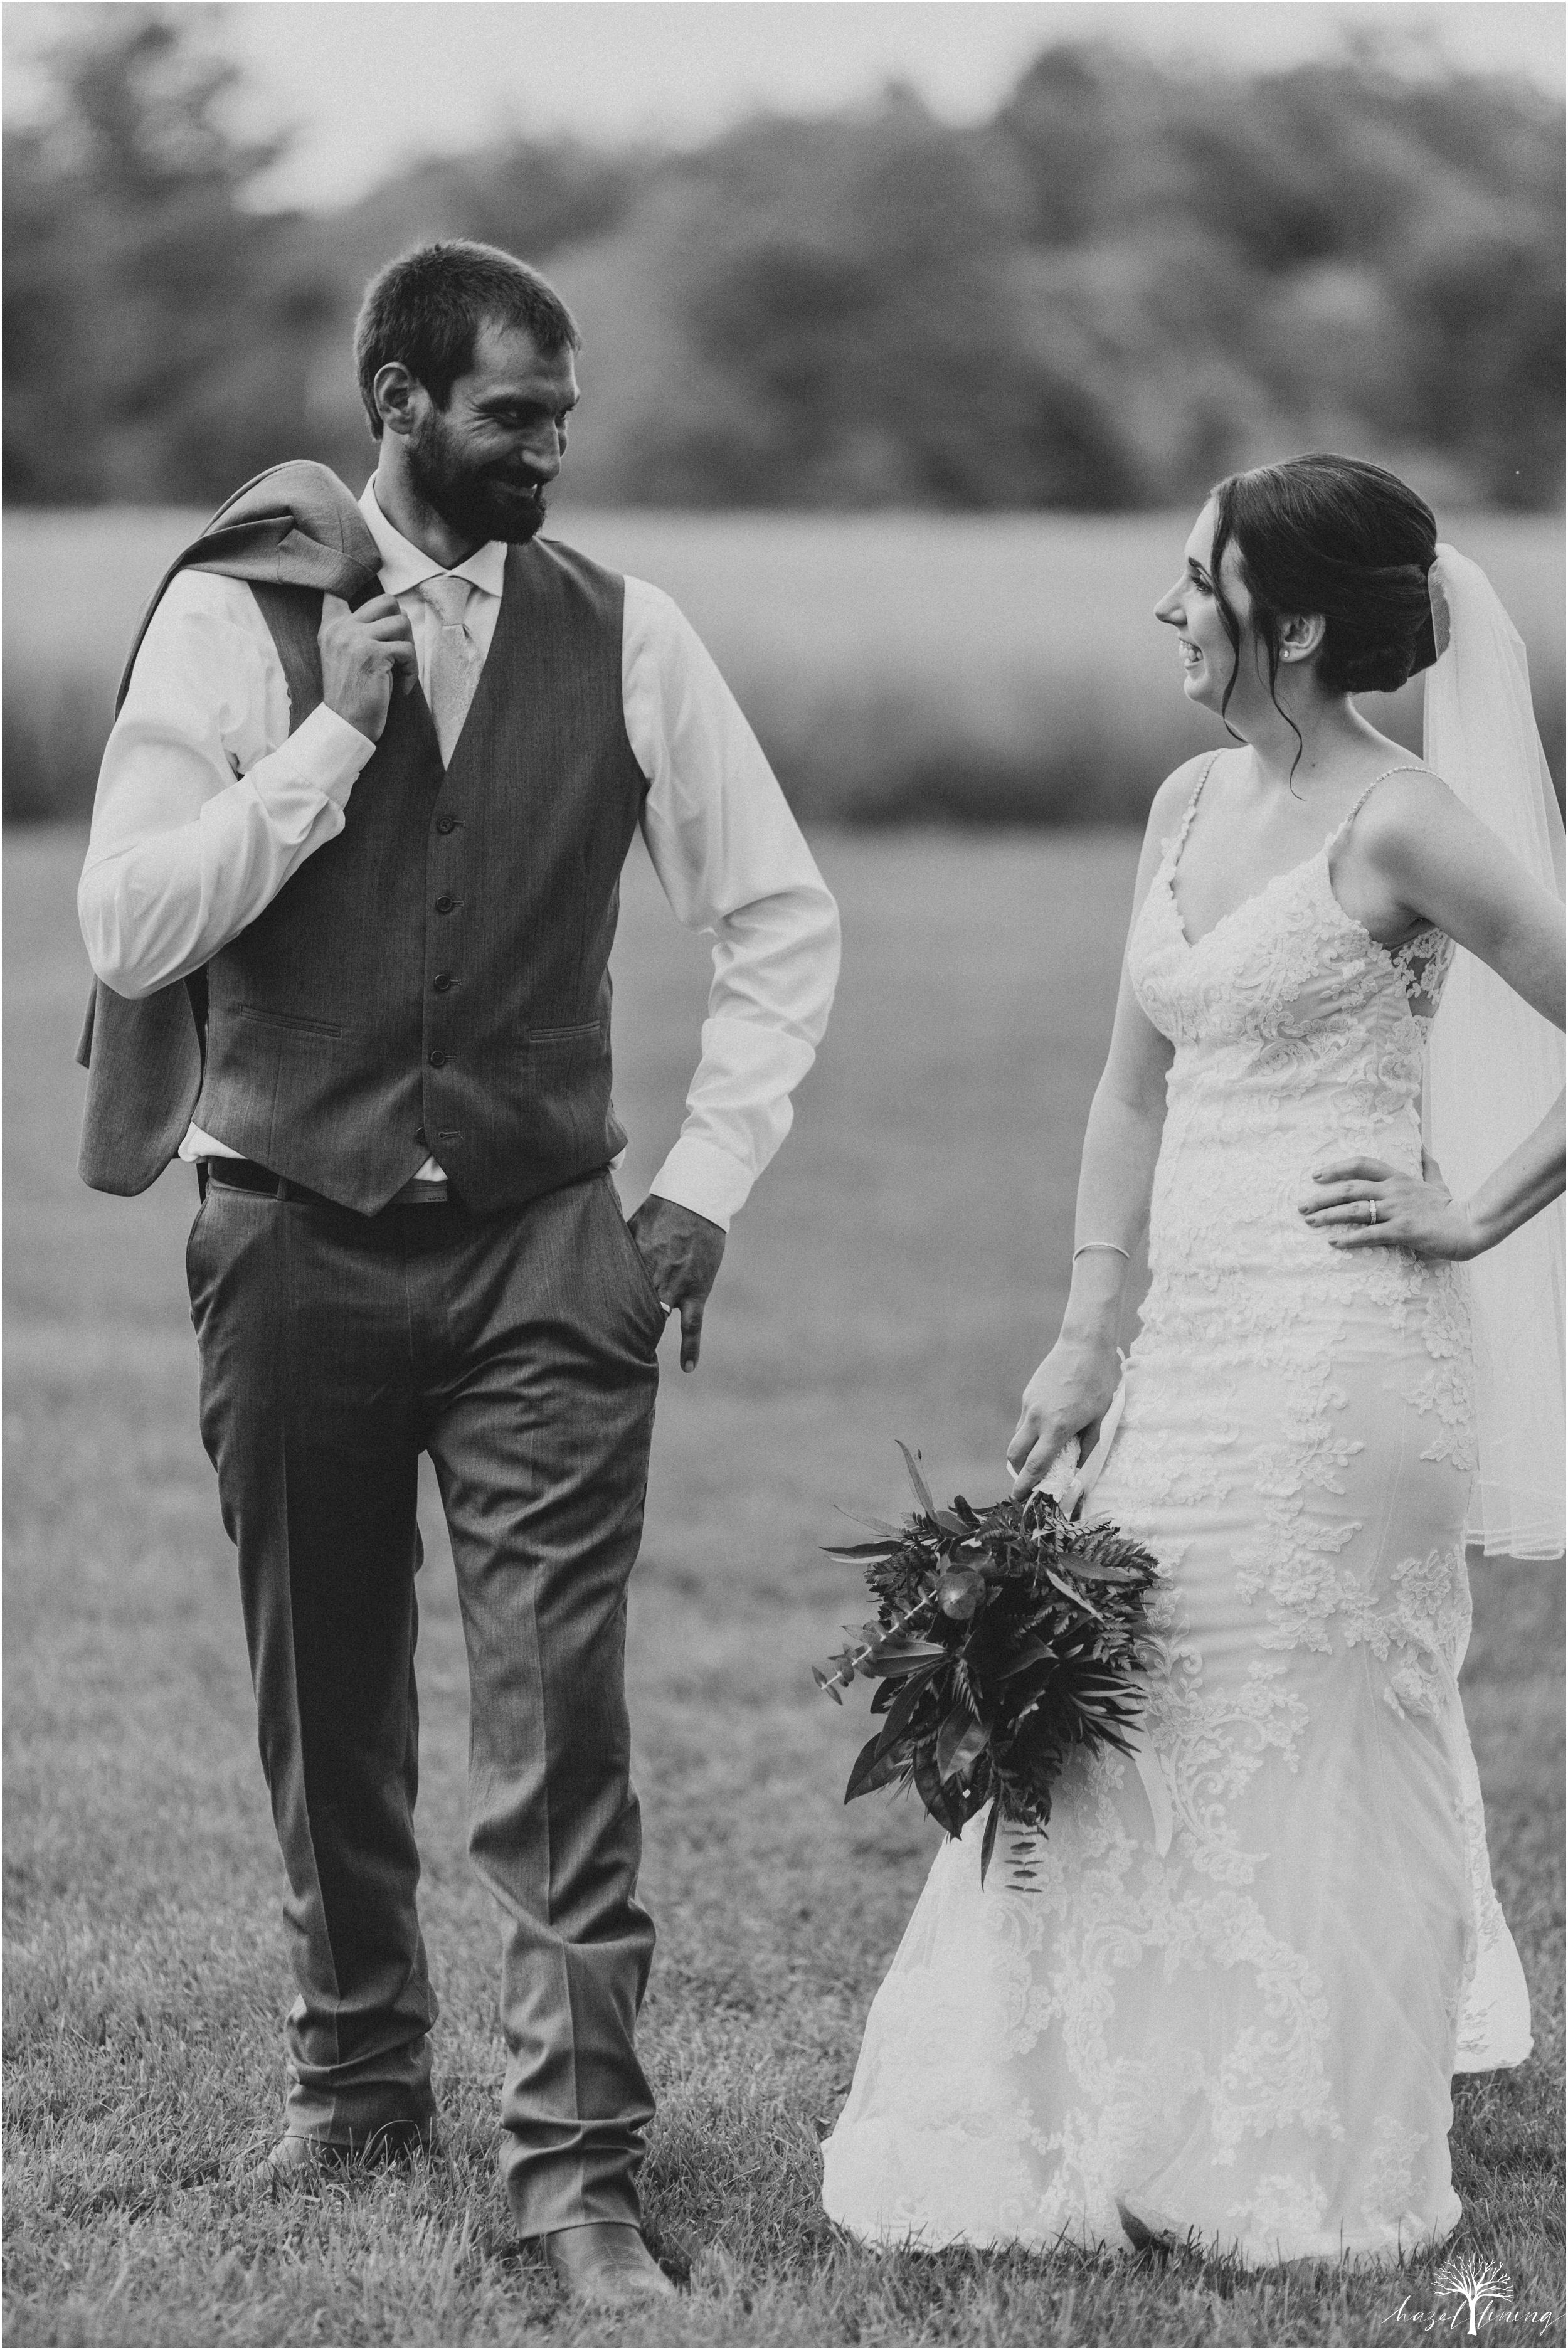 hazel-lining-travel-wedding-elopement-photography-lisa-landon-shoemaker-the-farm-bakery-and-events-bucks-county-quakertown-pennsylvania-summer-country-outdoor-farm-wedding_0099.jpg